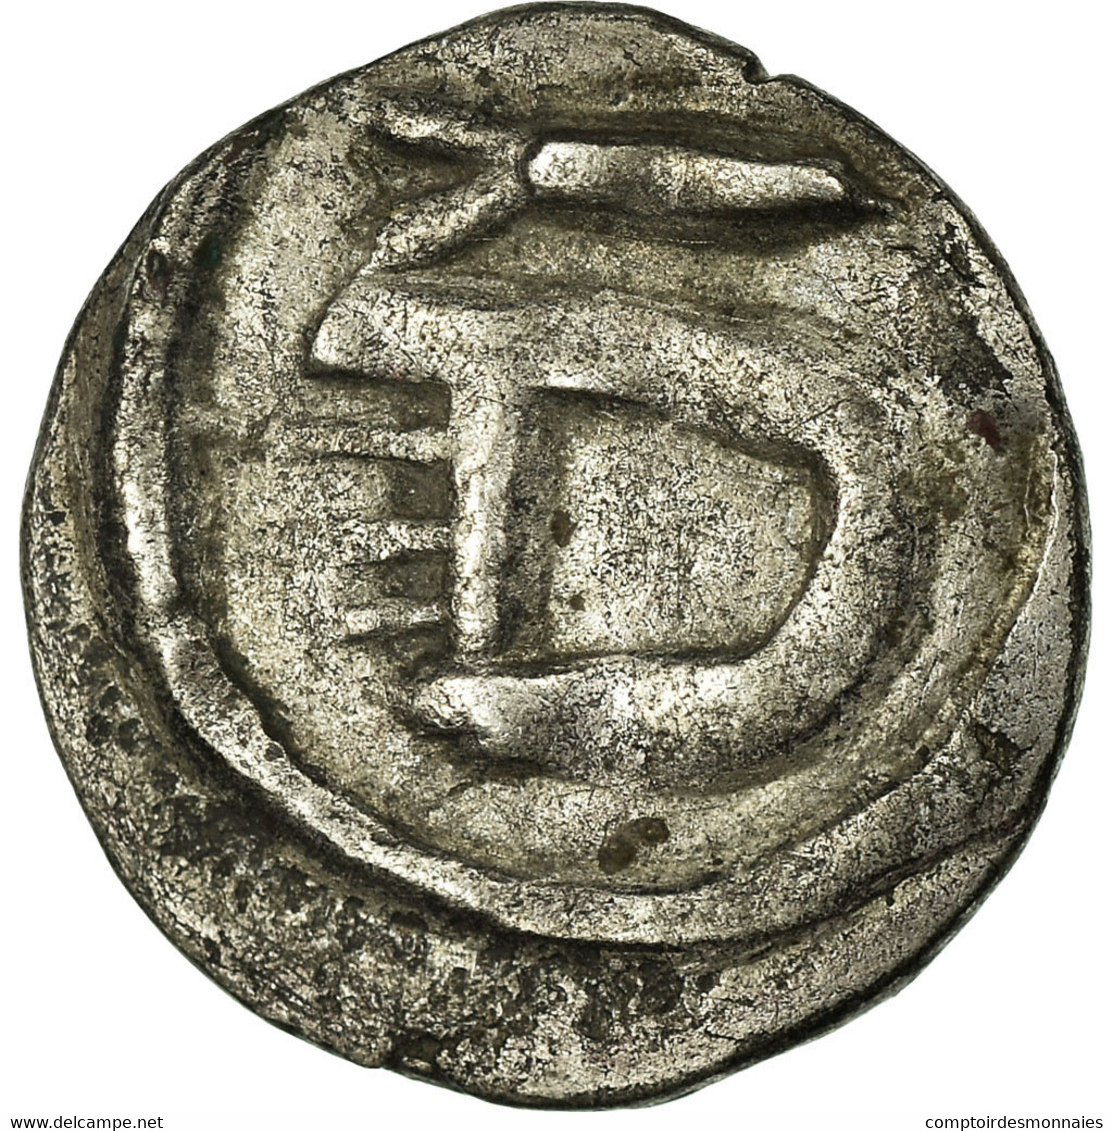 Monnaie, France, Denier, Metz, TTB+, Argent, Belfort:2967 - 470-751 Monete Merovingi